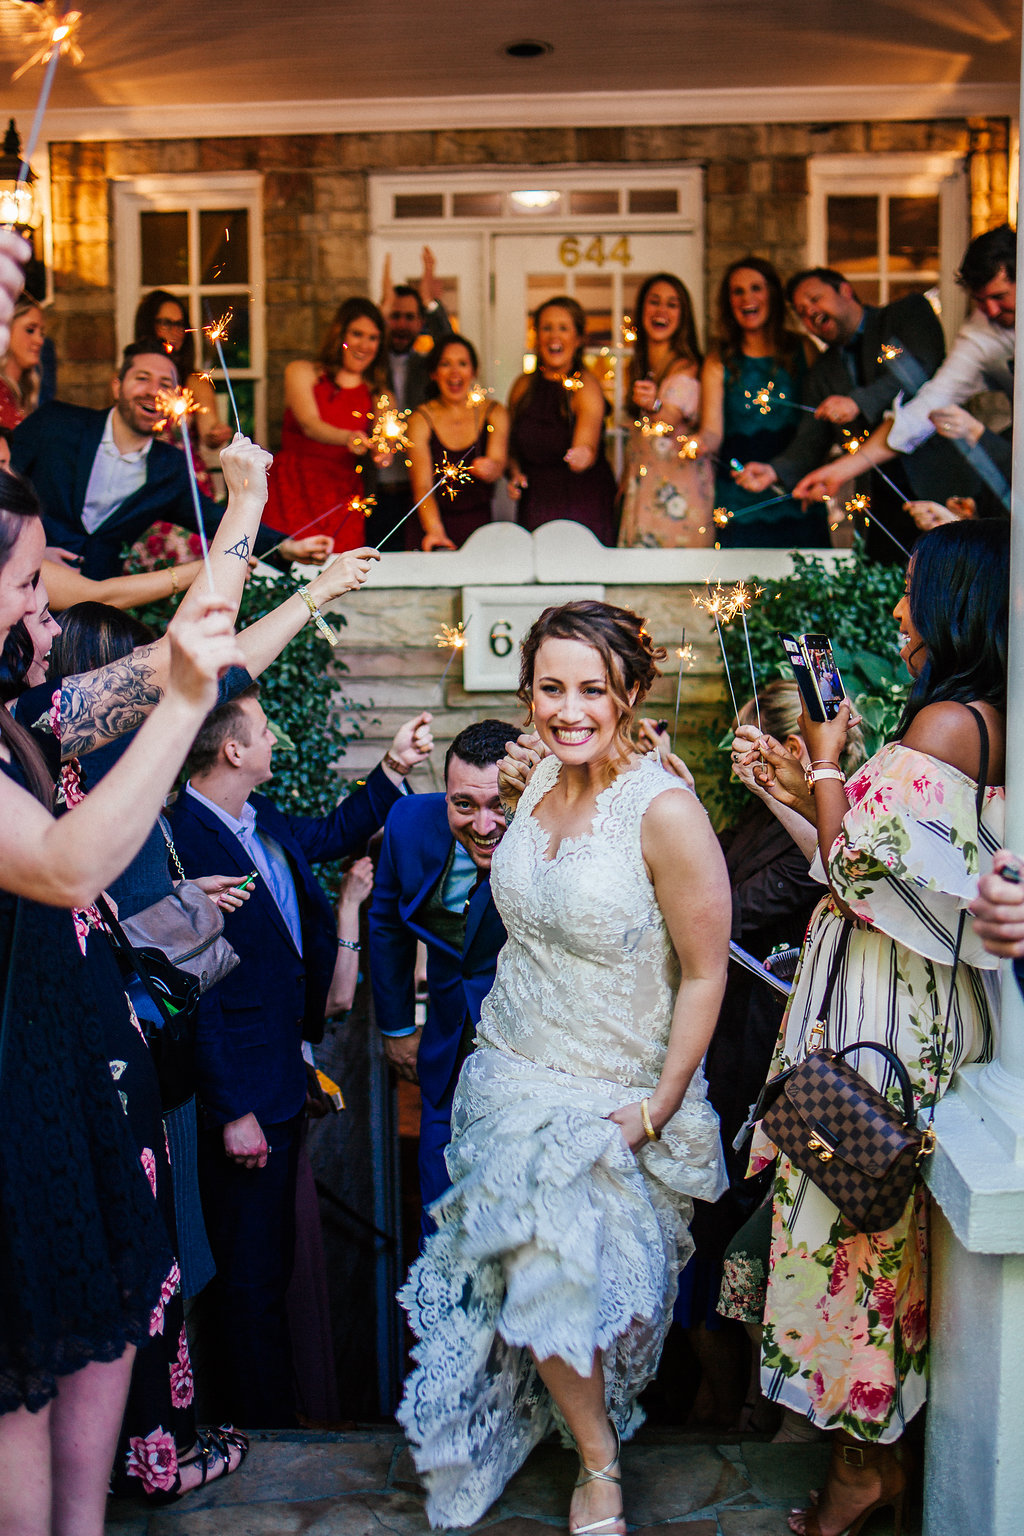 highland-ballroom-poncey-highland-atlanta-wedding-photographer-angela-elliott-wingard-indie-wedding-255.jpg